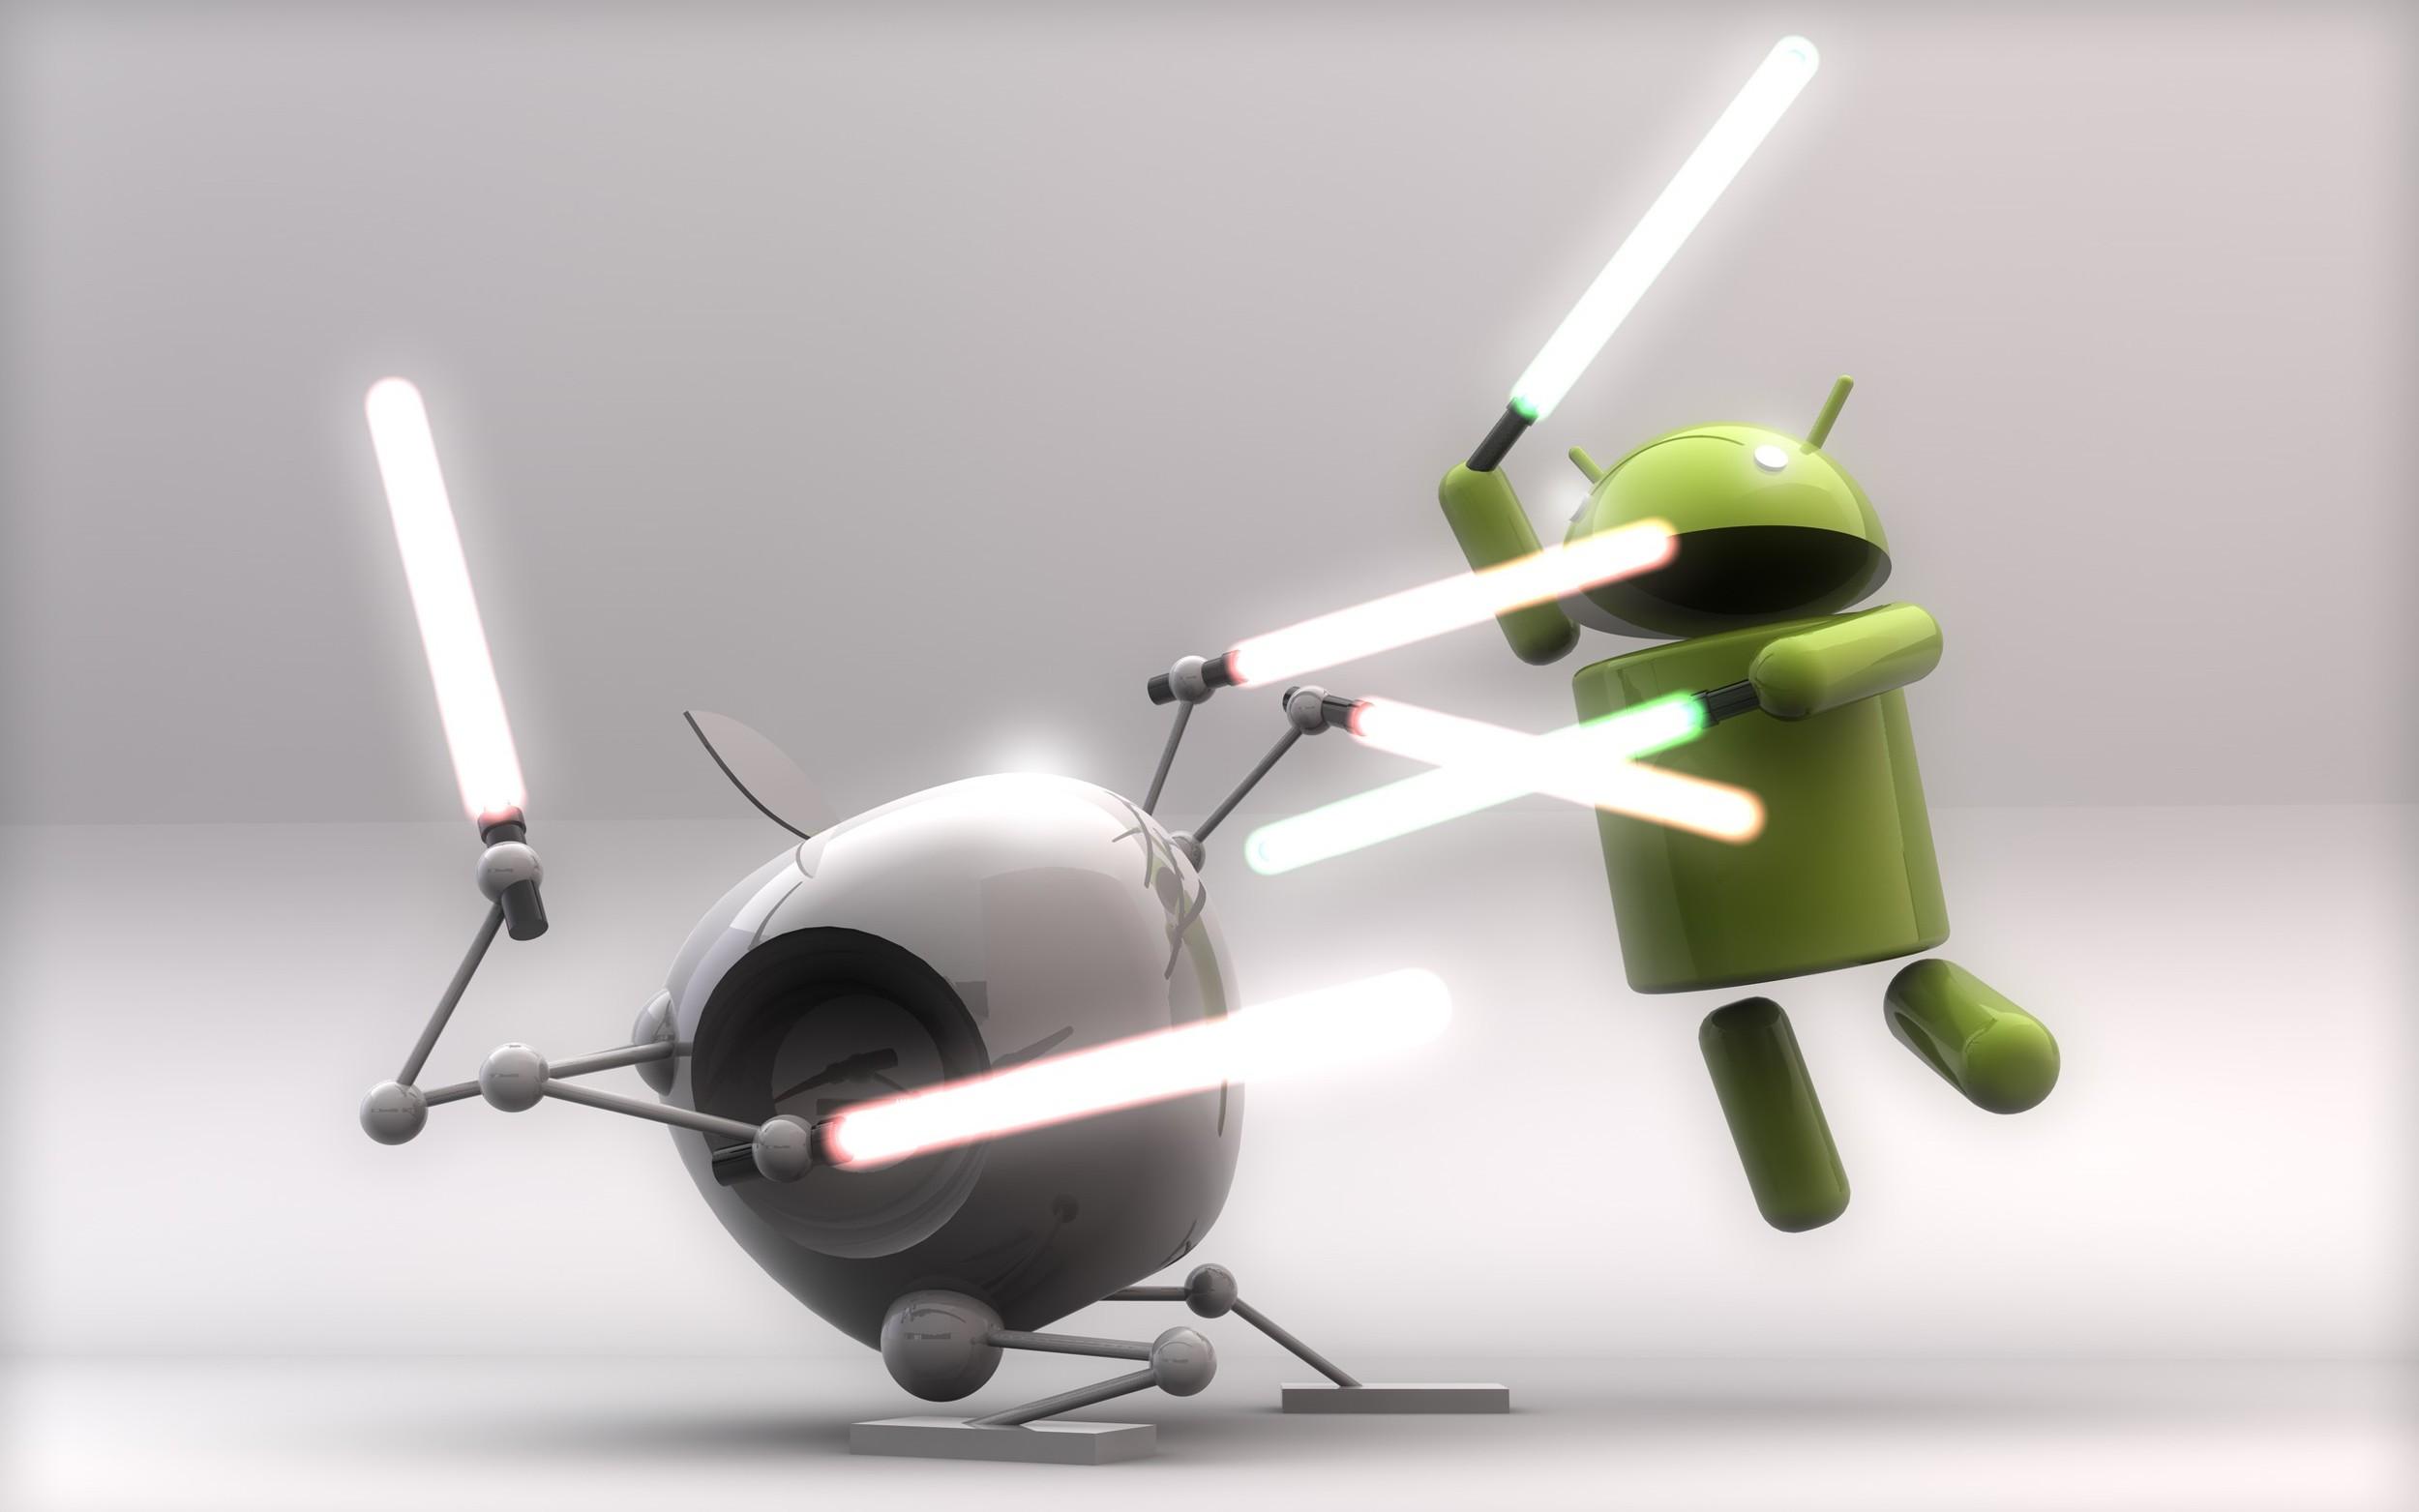 http://techsmash.net/wp-content/uploads/2014/Uploaded/Android.Apple.Fight.jpg